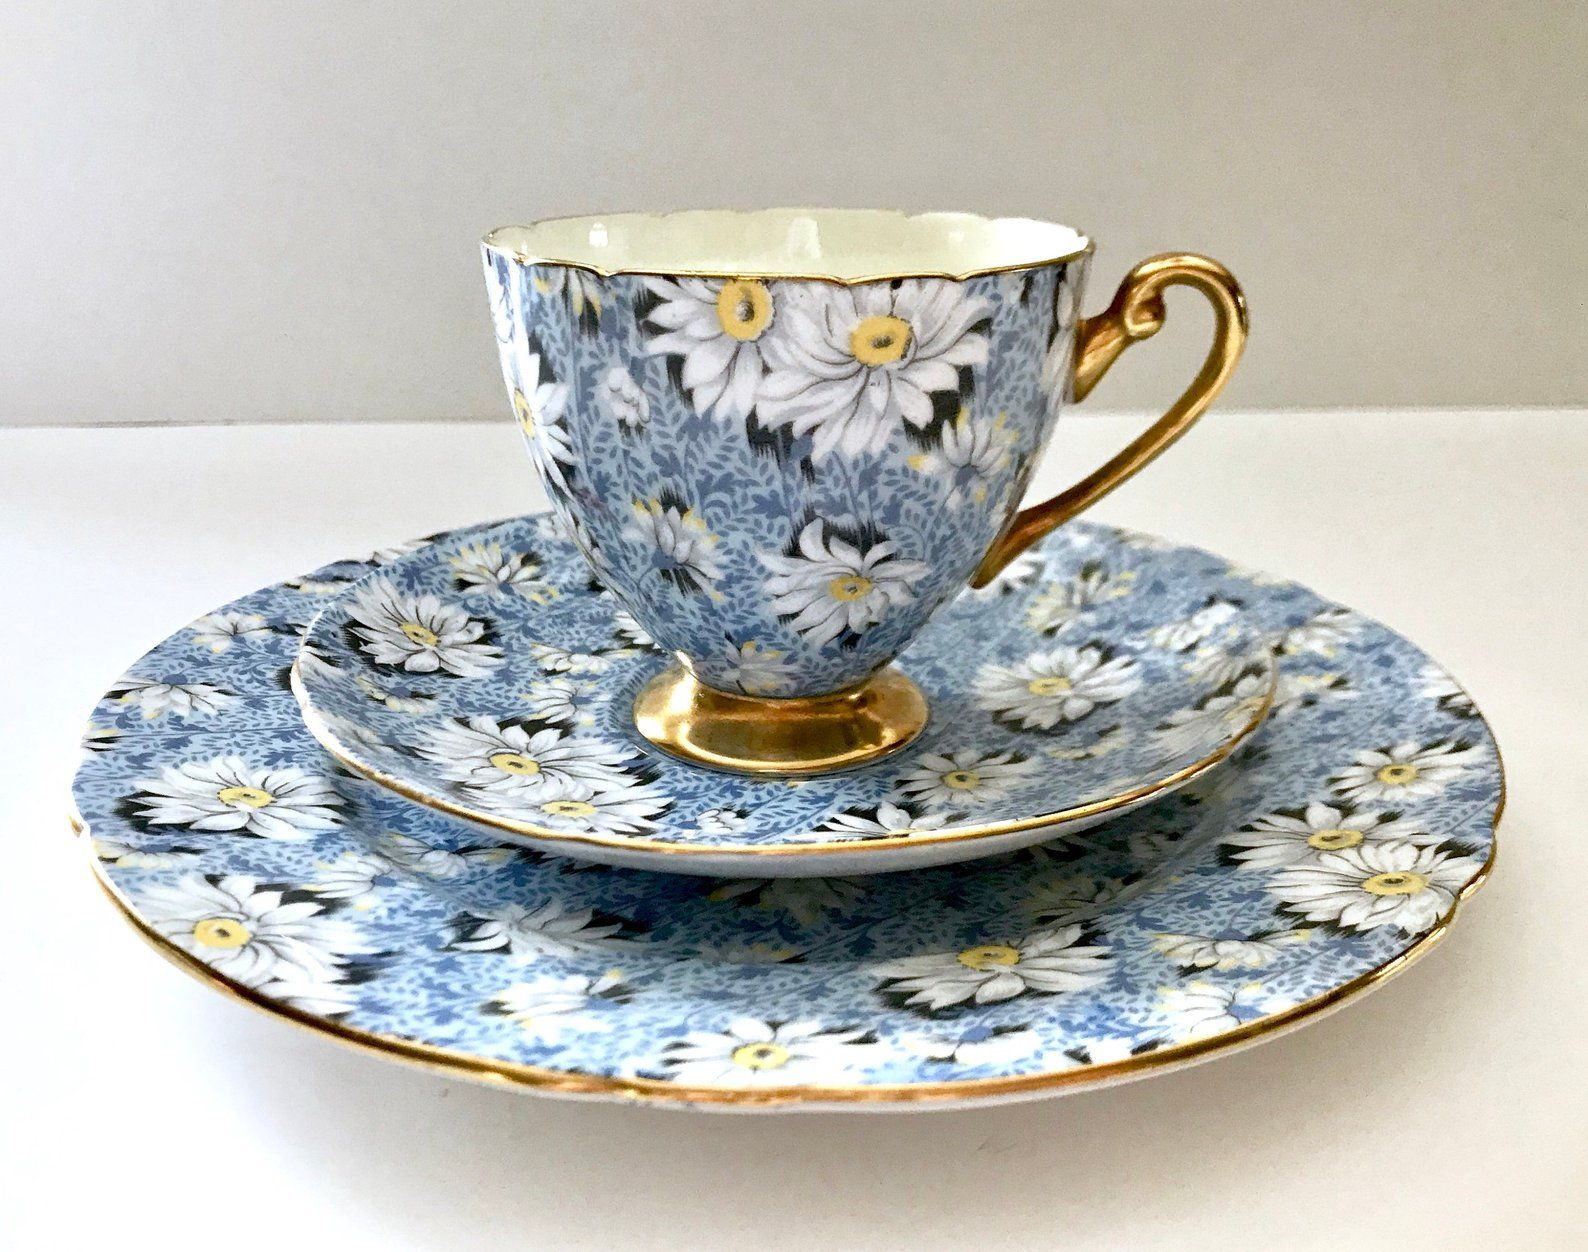 Vintage Shelley Chintz Tea Cup Saucer Blue Daisy Pattern Etsy Tea Cups Tea Cups Vintage Tea